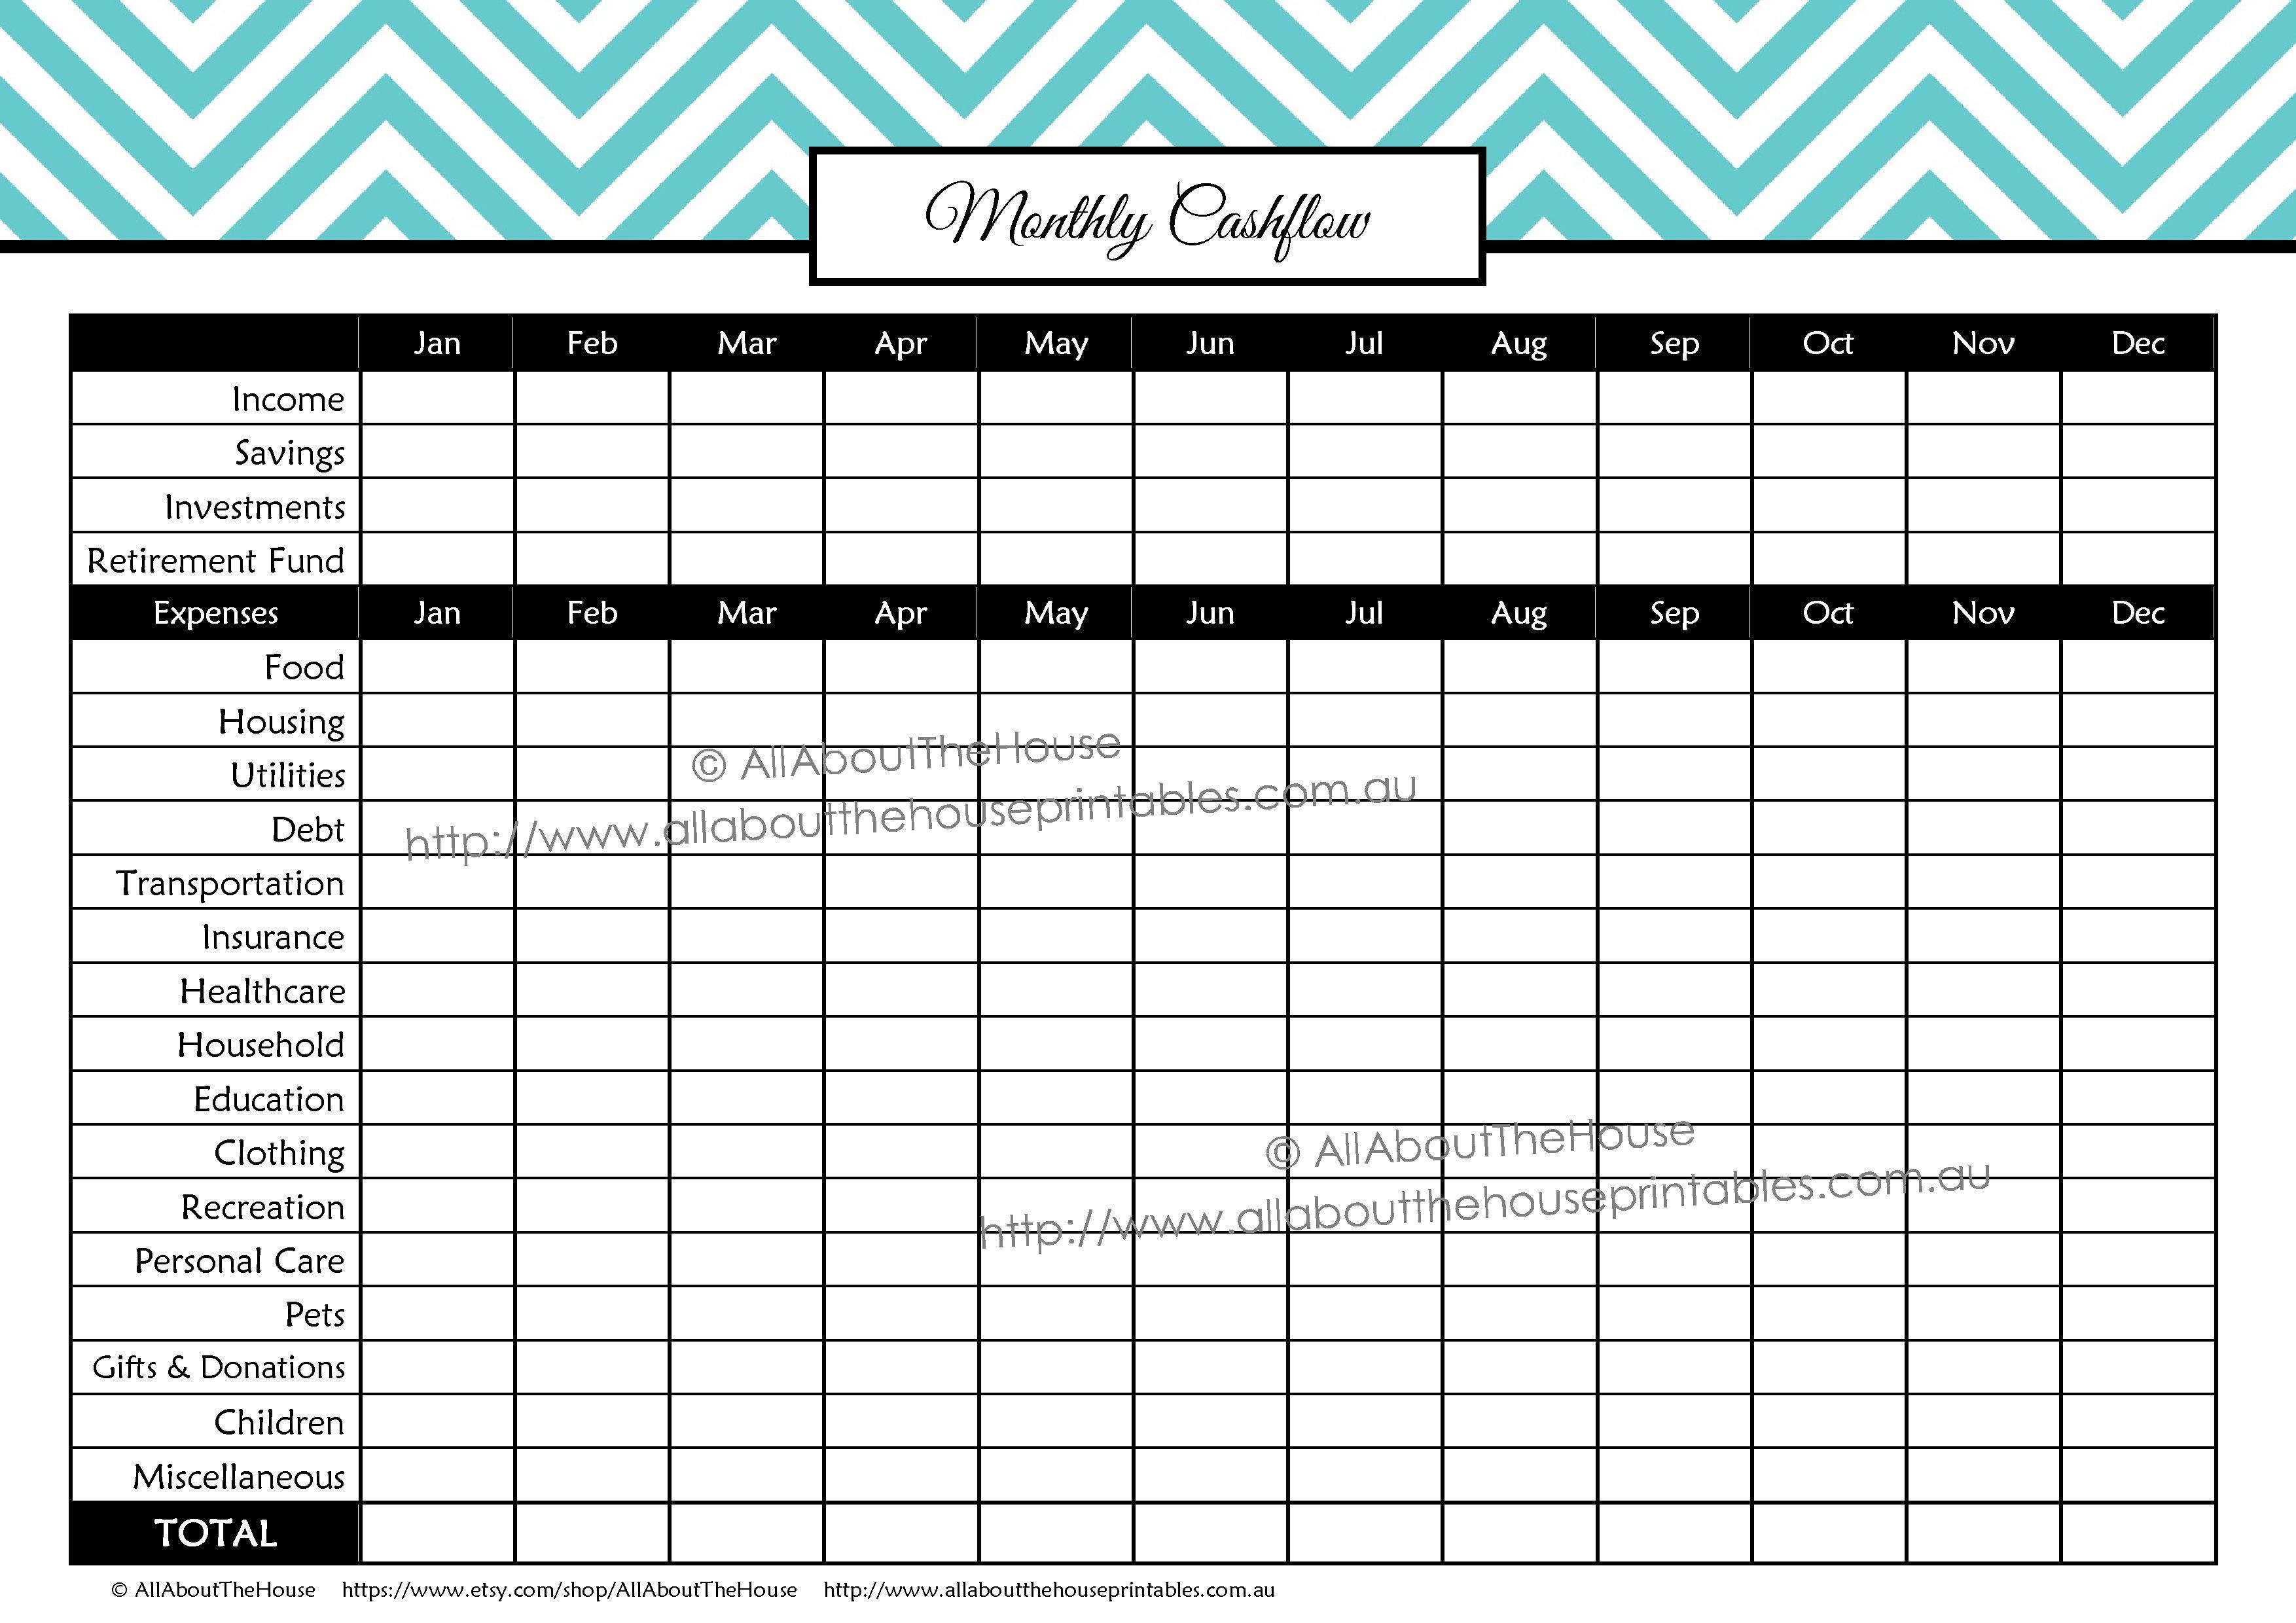 Monthly Spending Summary Budget Binder Planner Printable